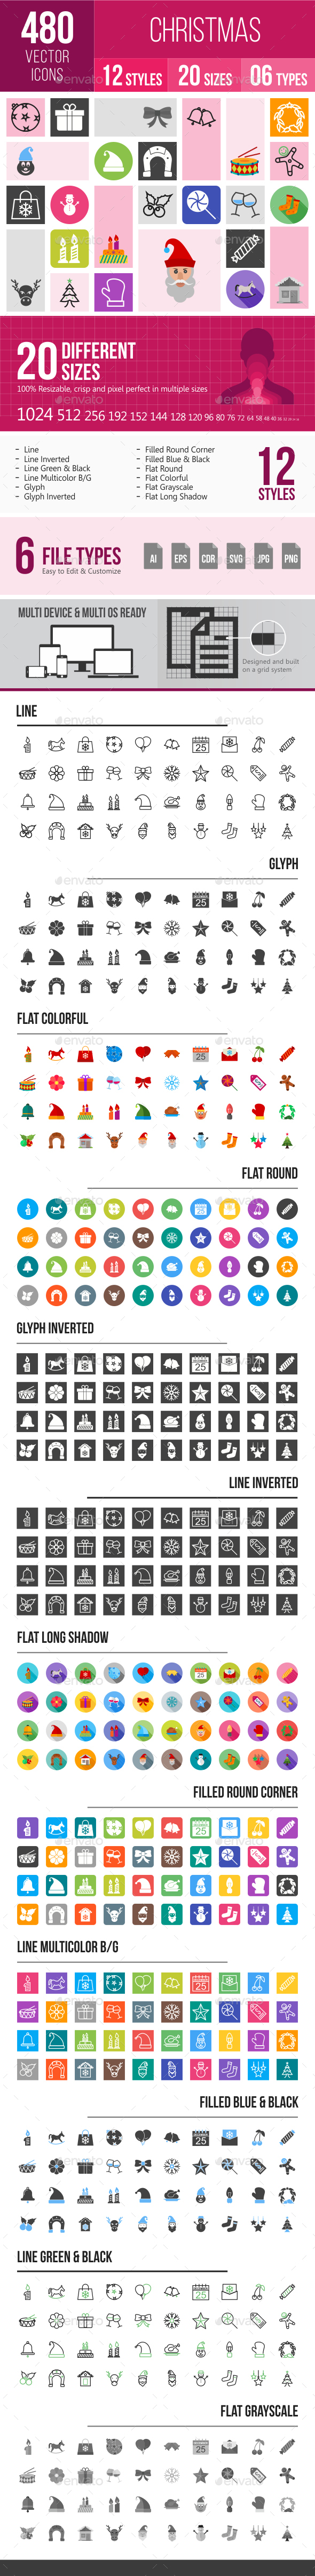 480 Christmas Icons - Icons